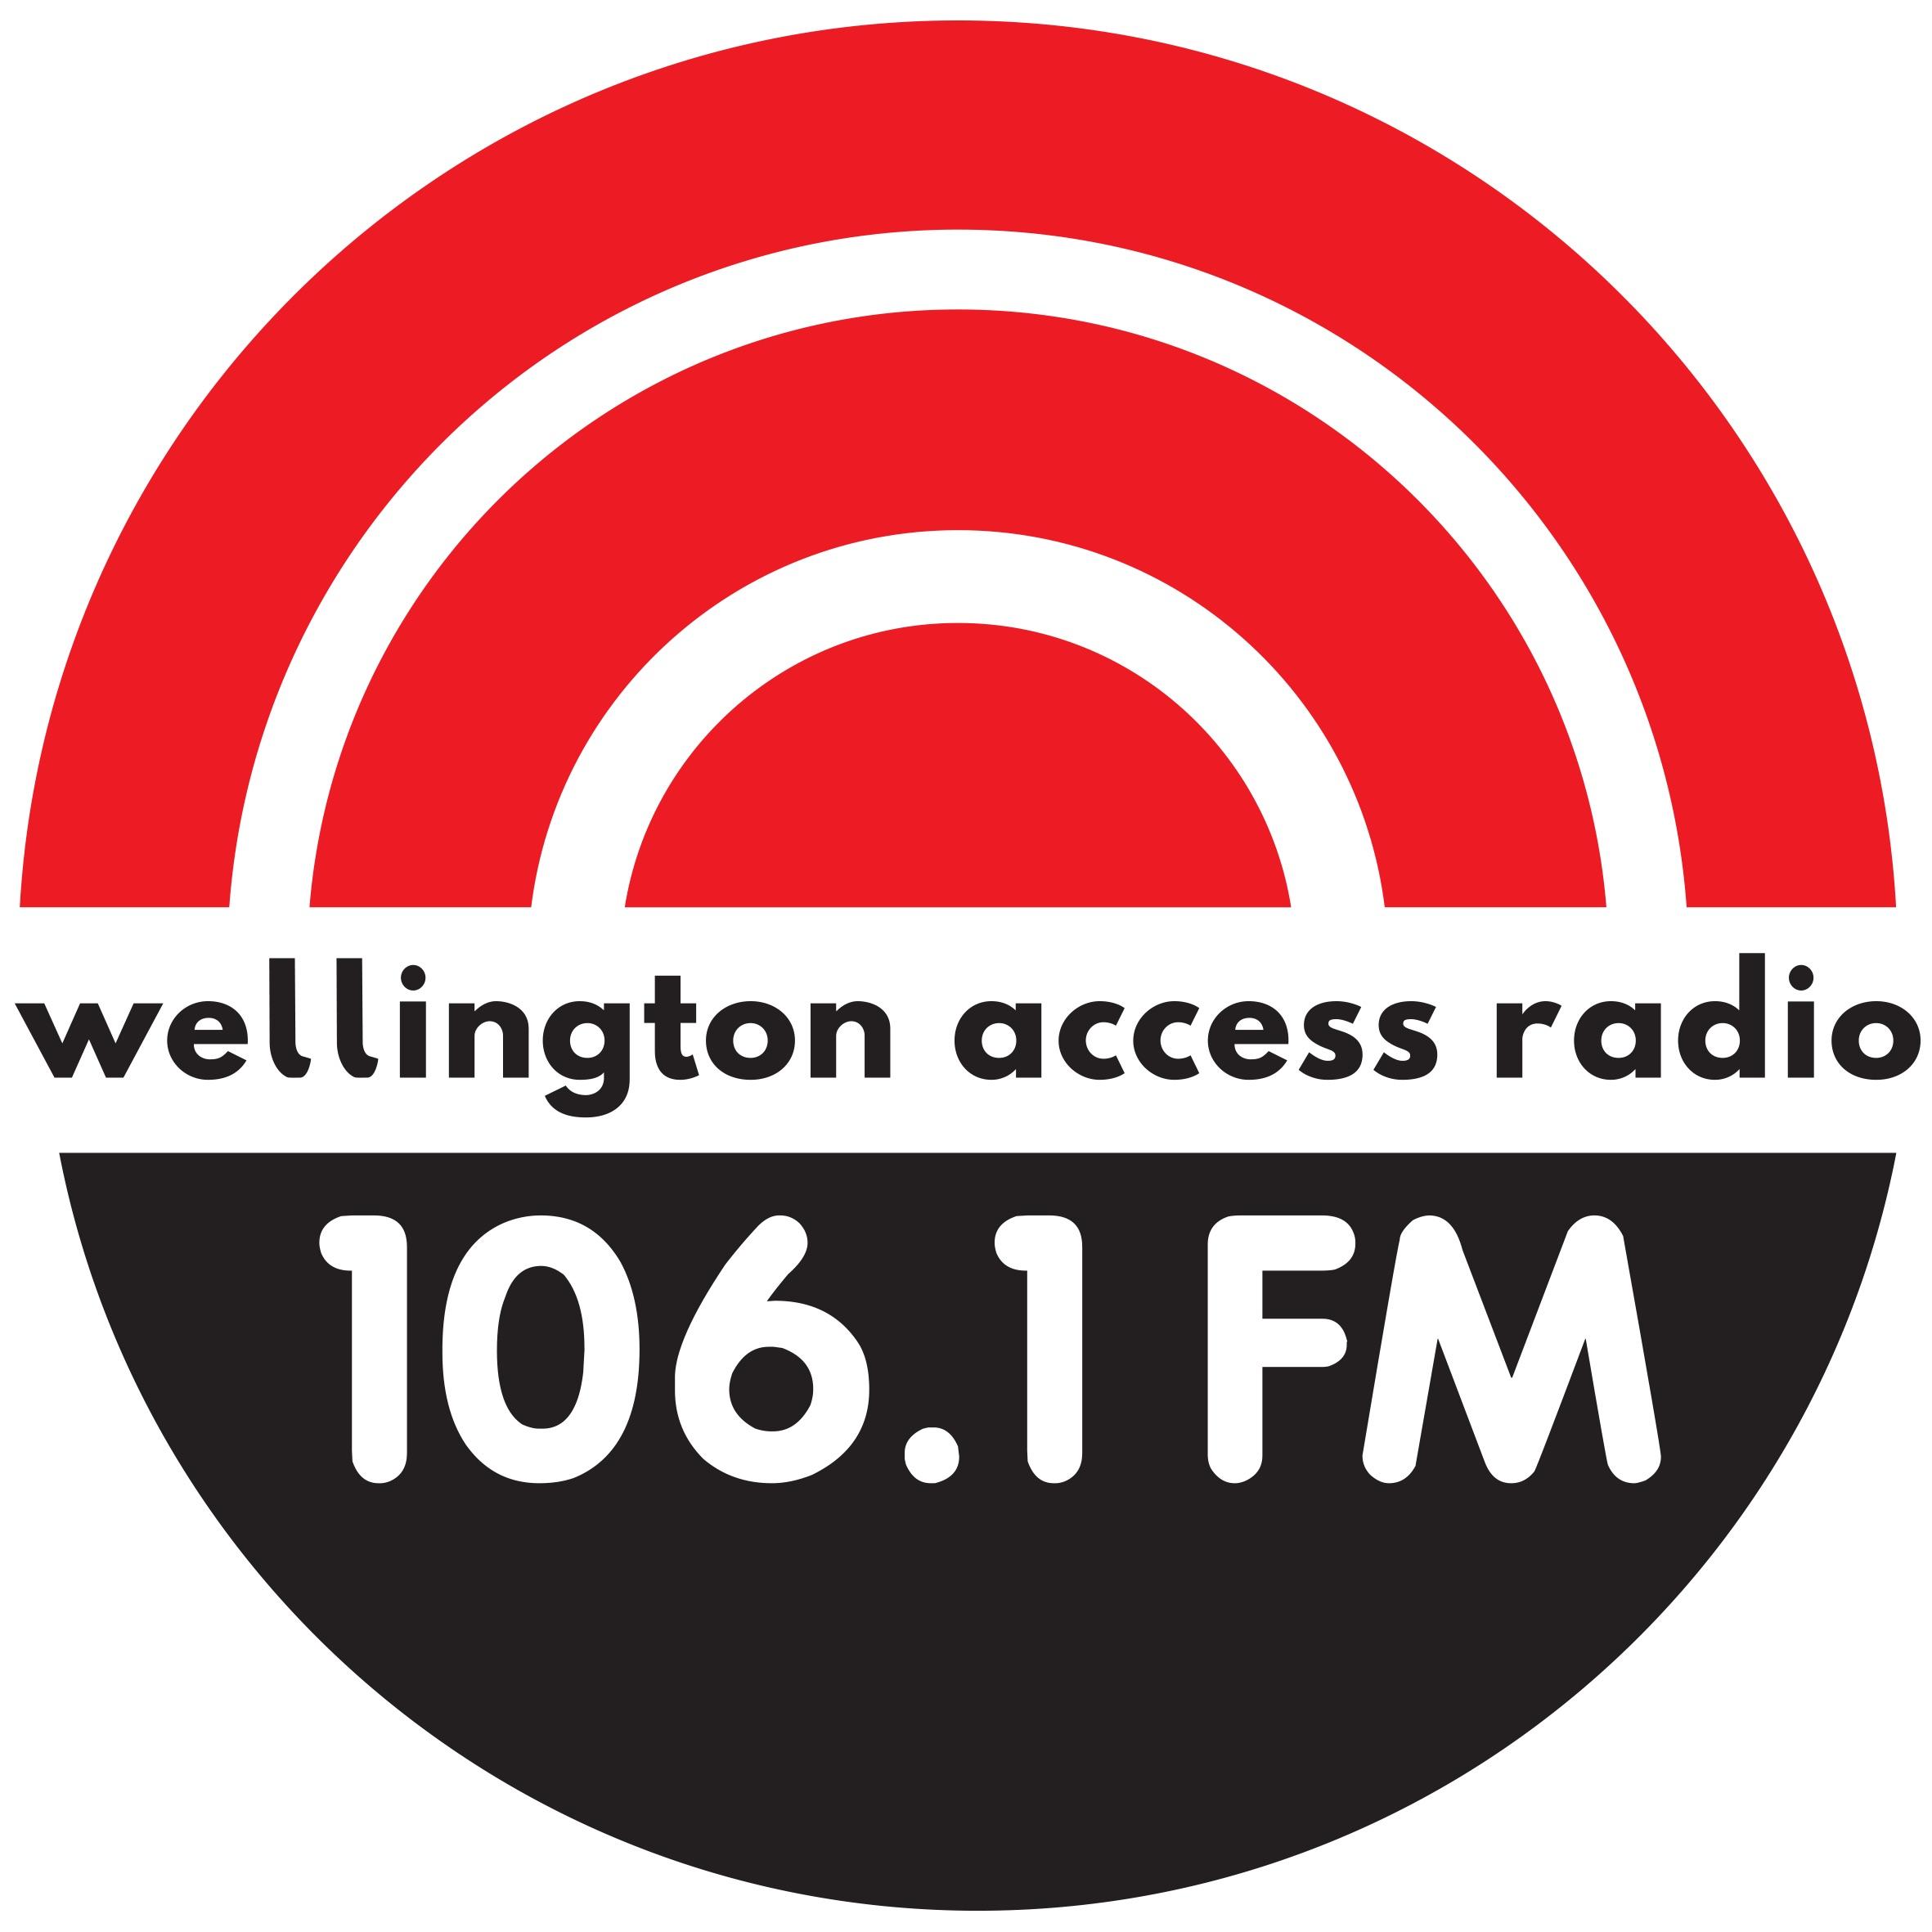 Wellington Access Radio logo copy.jpg